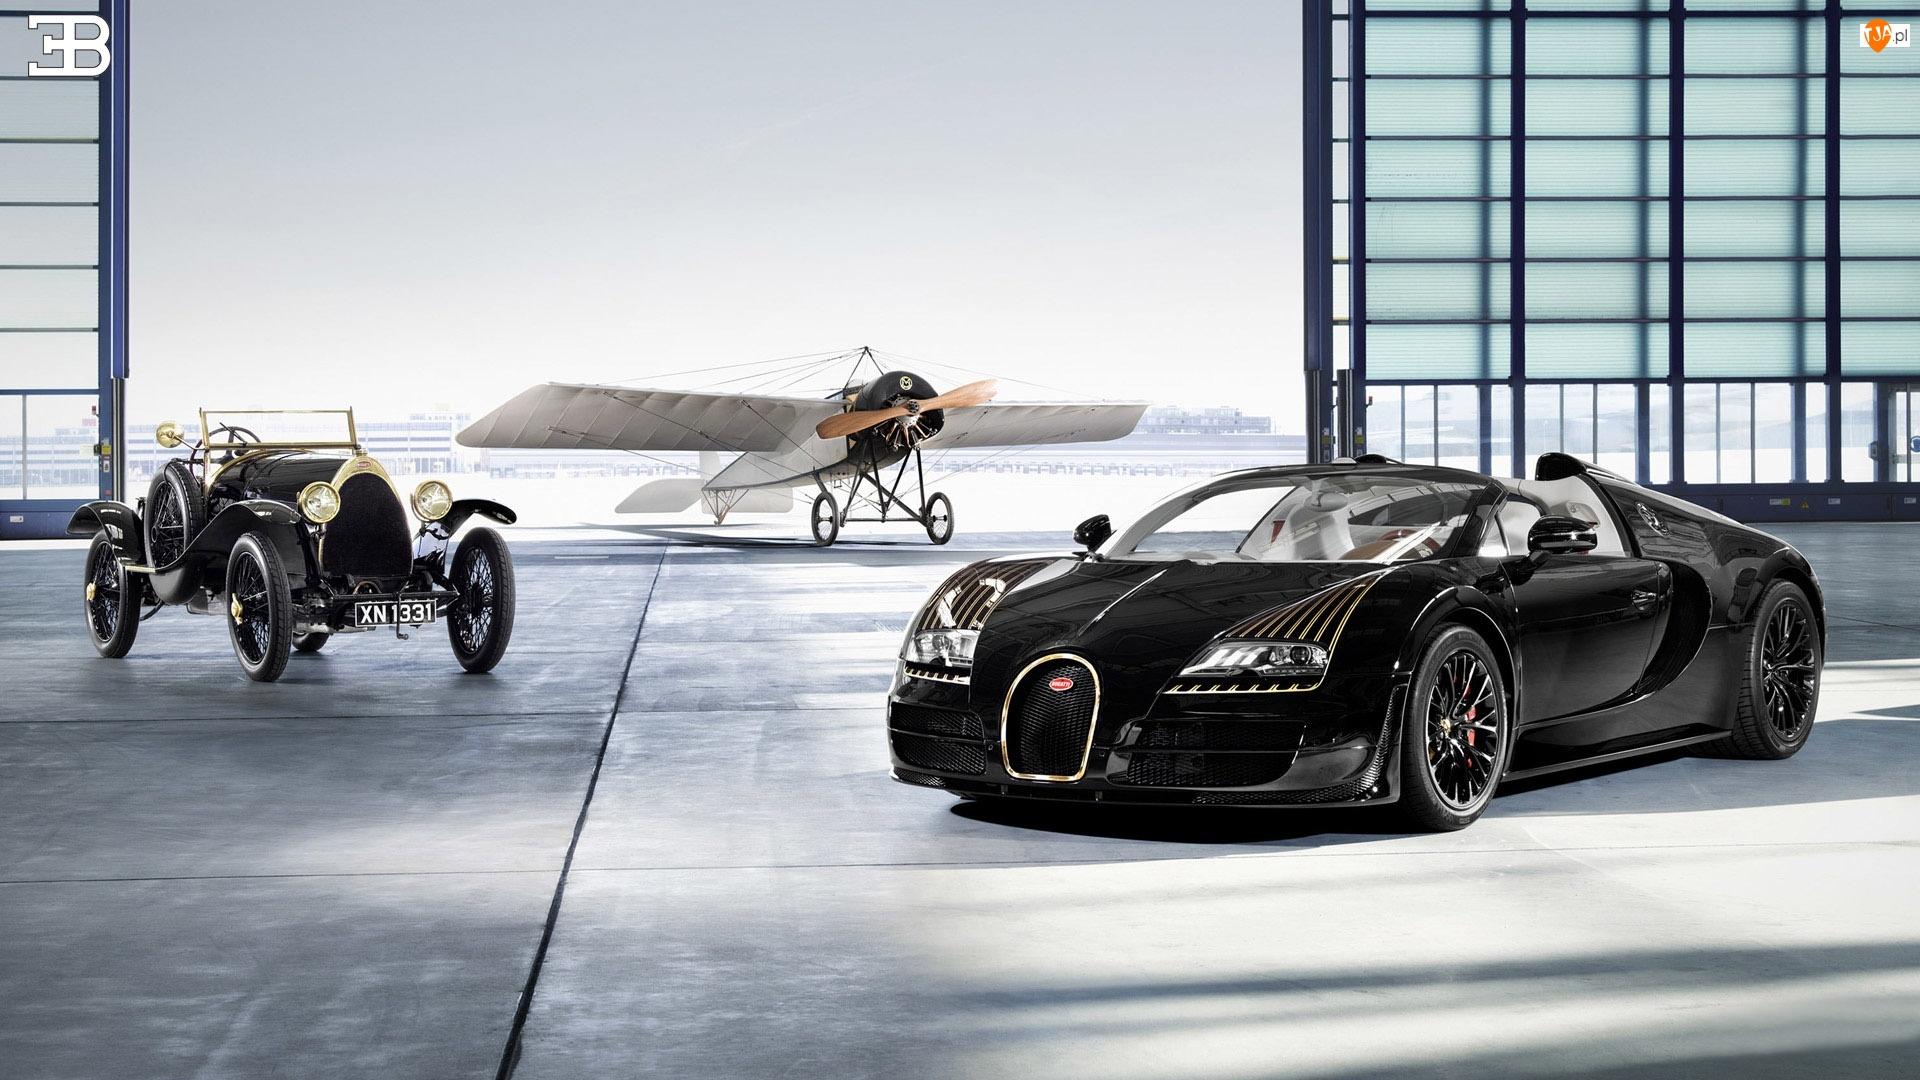 Samolot, Hangar, Zabytkowy, Samochód, Bugatti